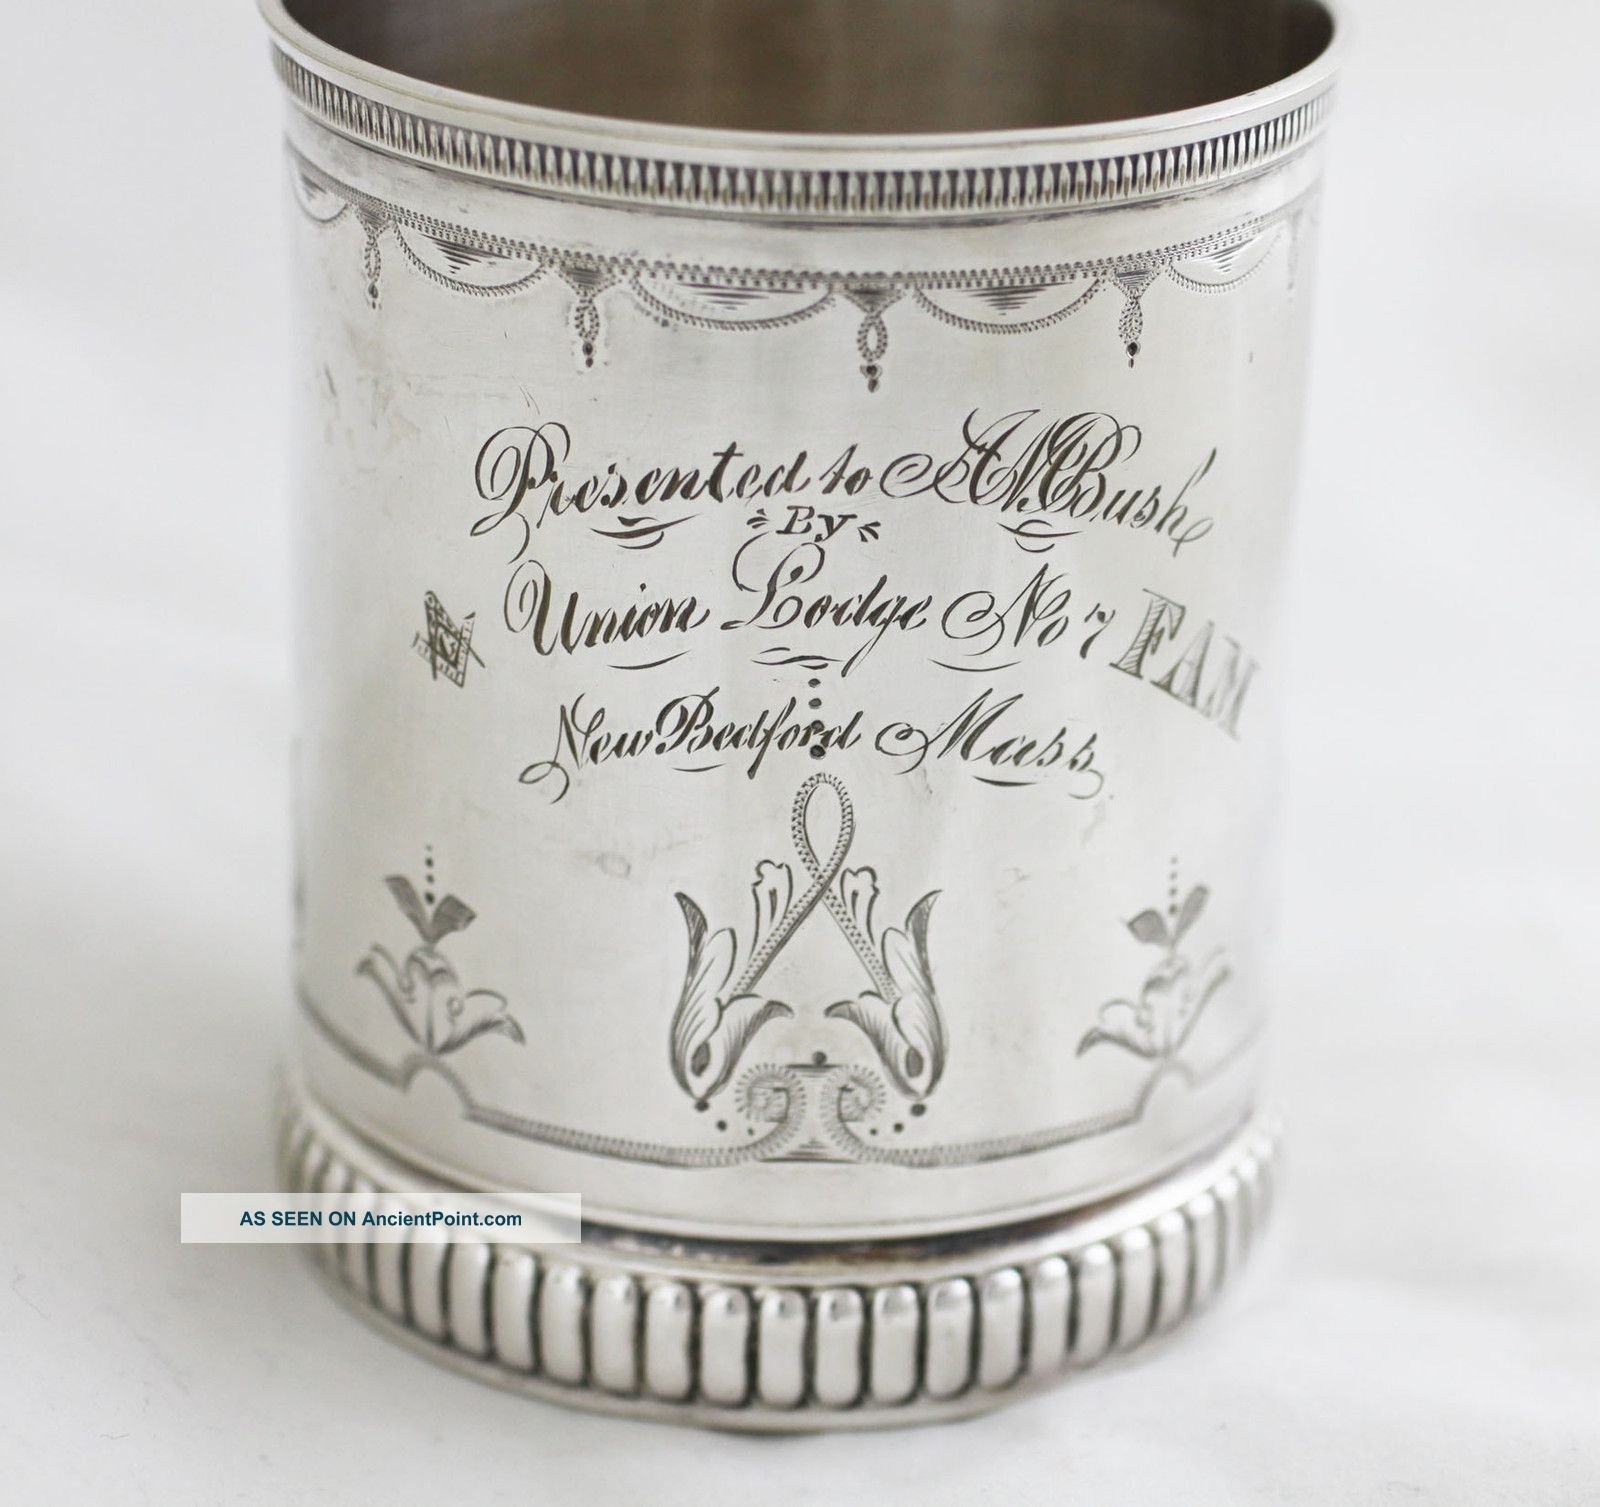 Early Gorham Sterling Mug Freemason Masonic Union Lodge No.  7 5.  1oz Cups & Goblets photo